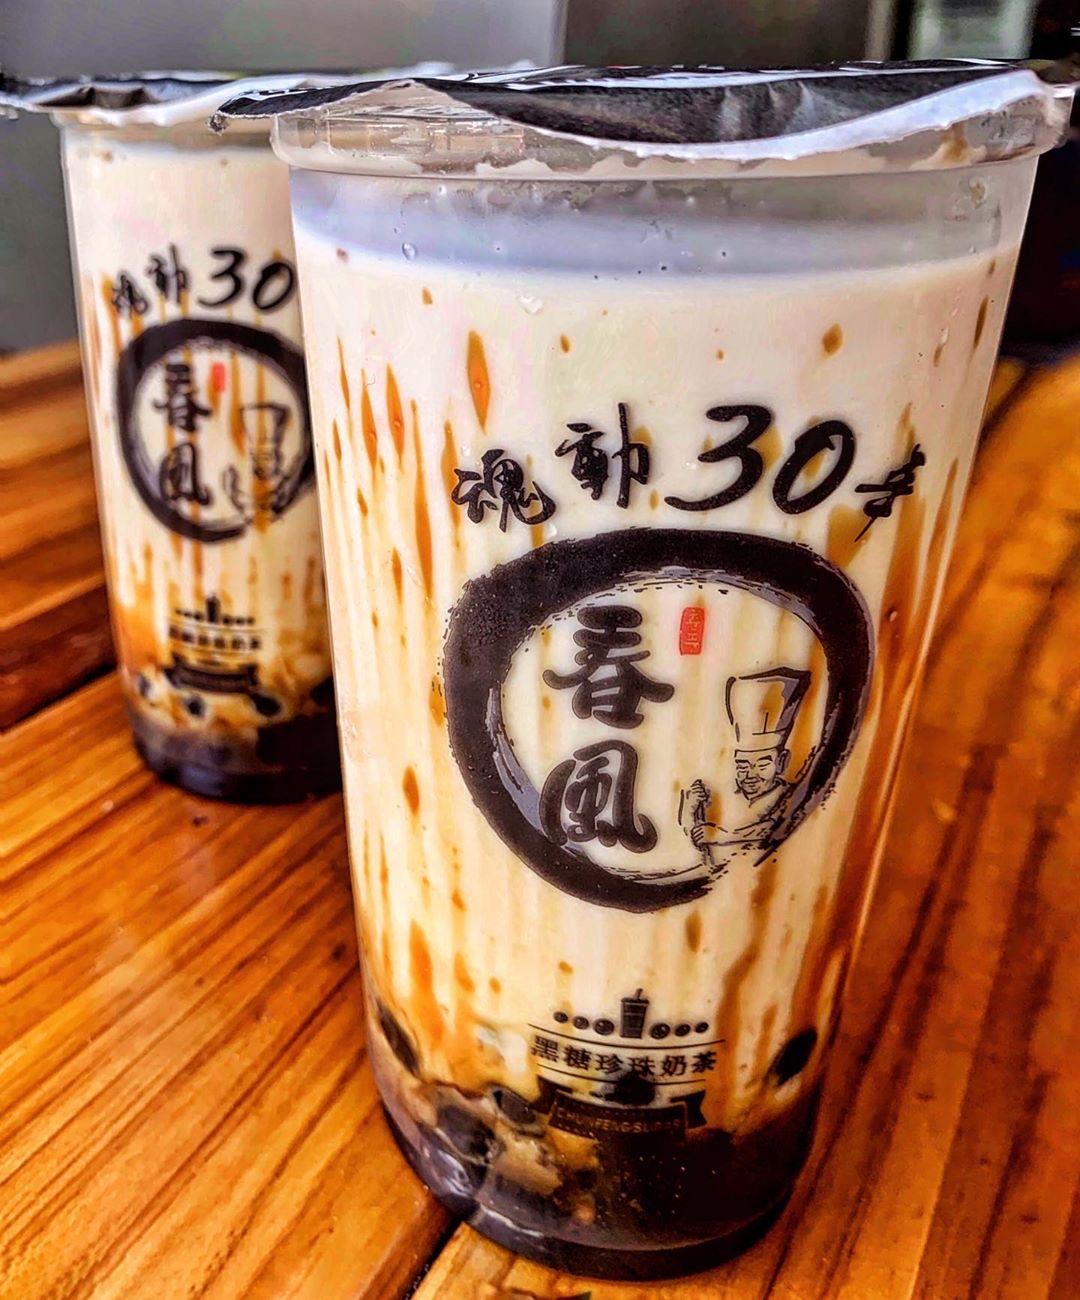 Chunfeng Brown Sugar Milk Tea